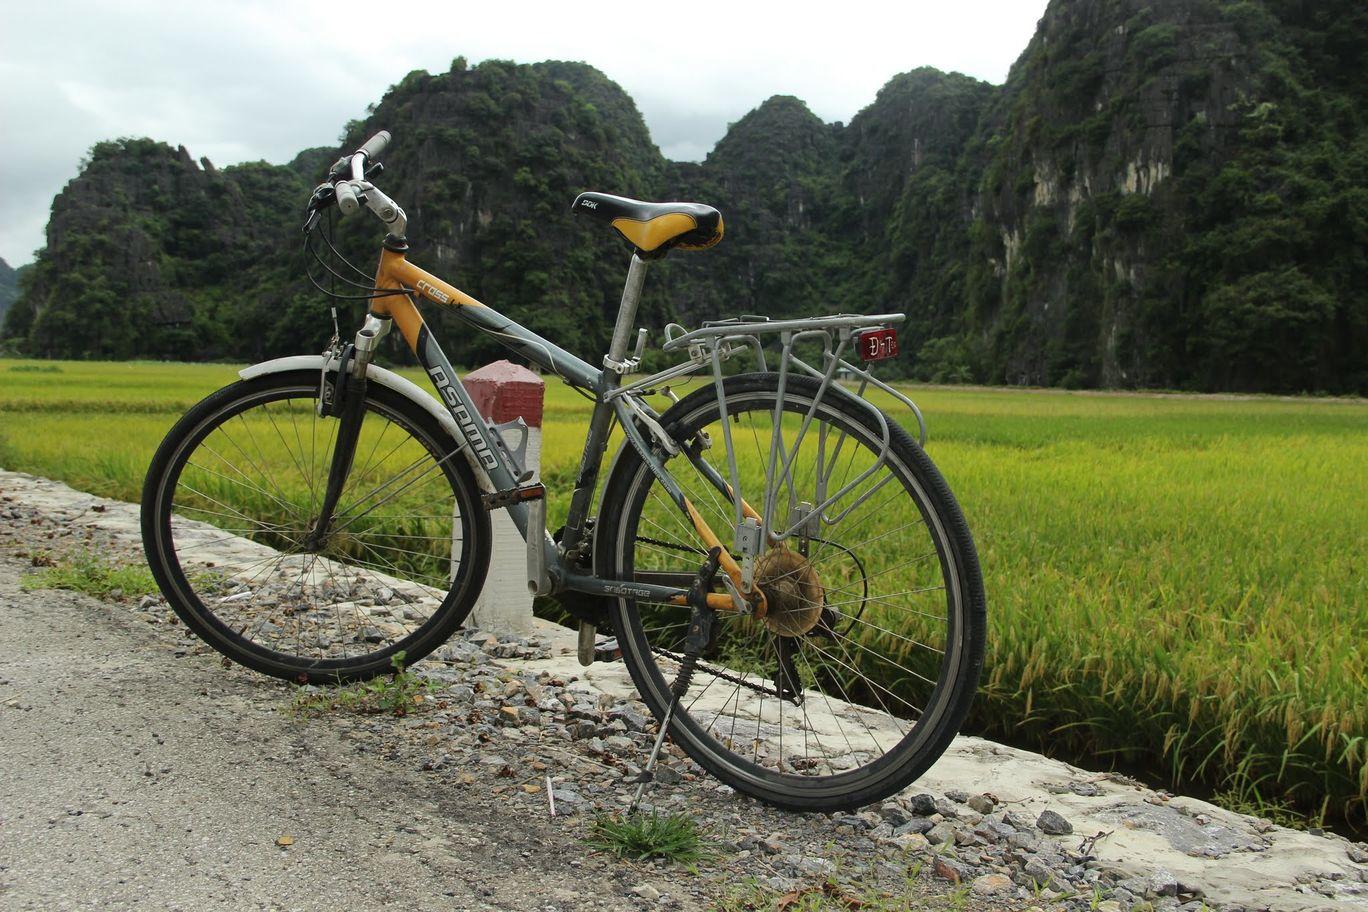 Photo of Tam Coc Ninh Binh By Prem Kumar